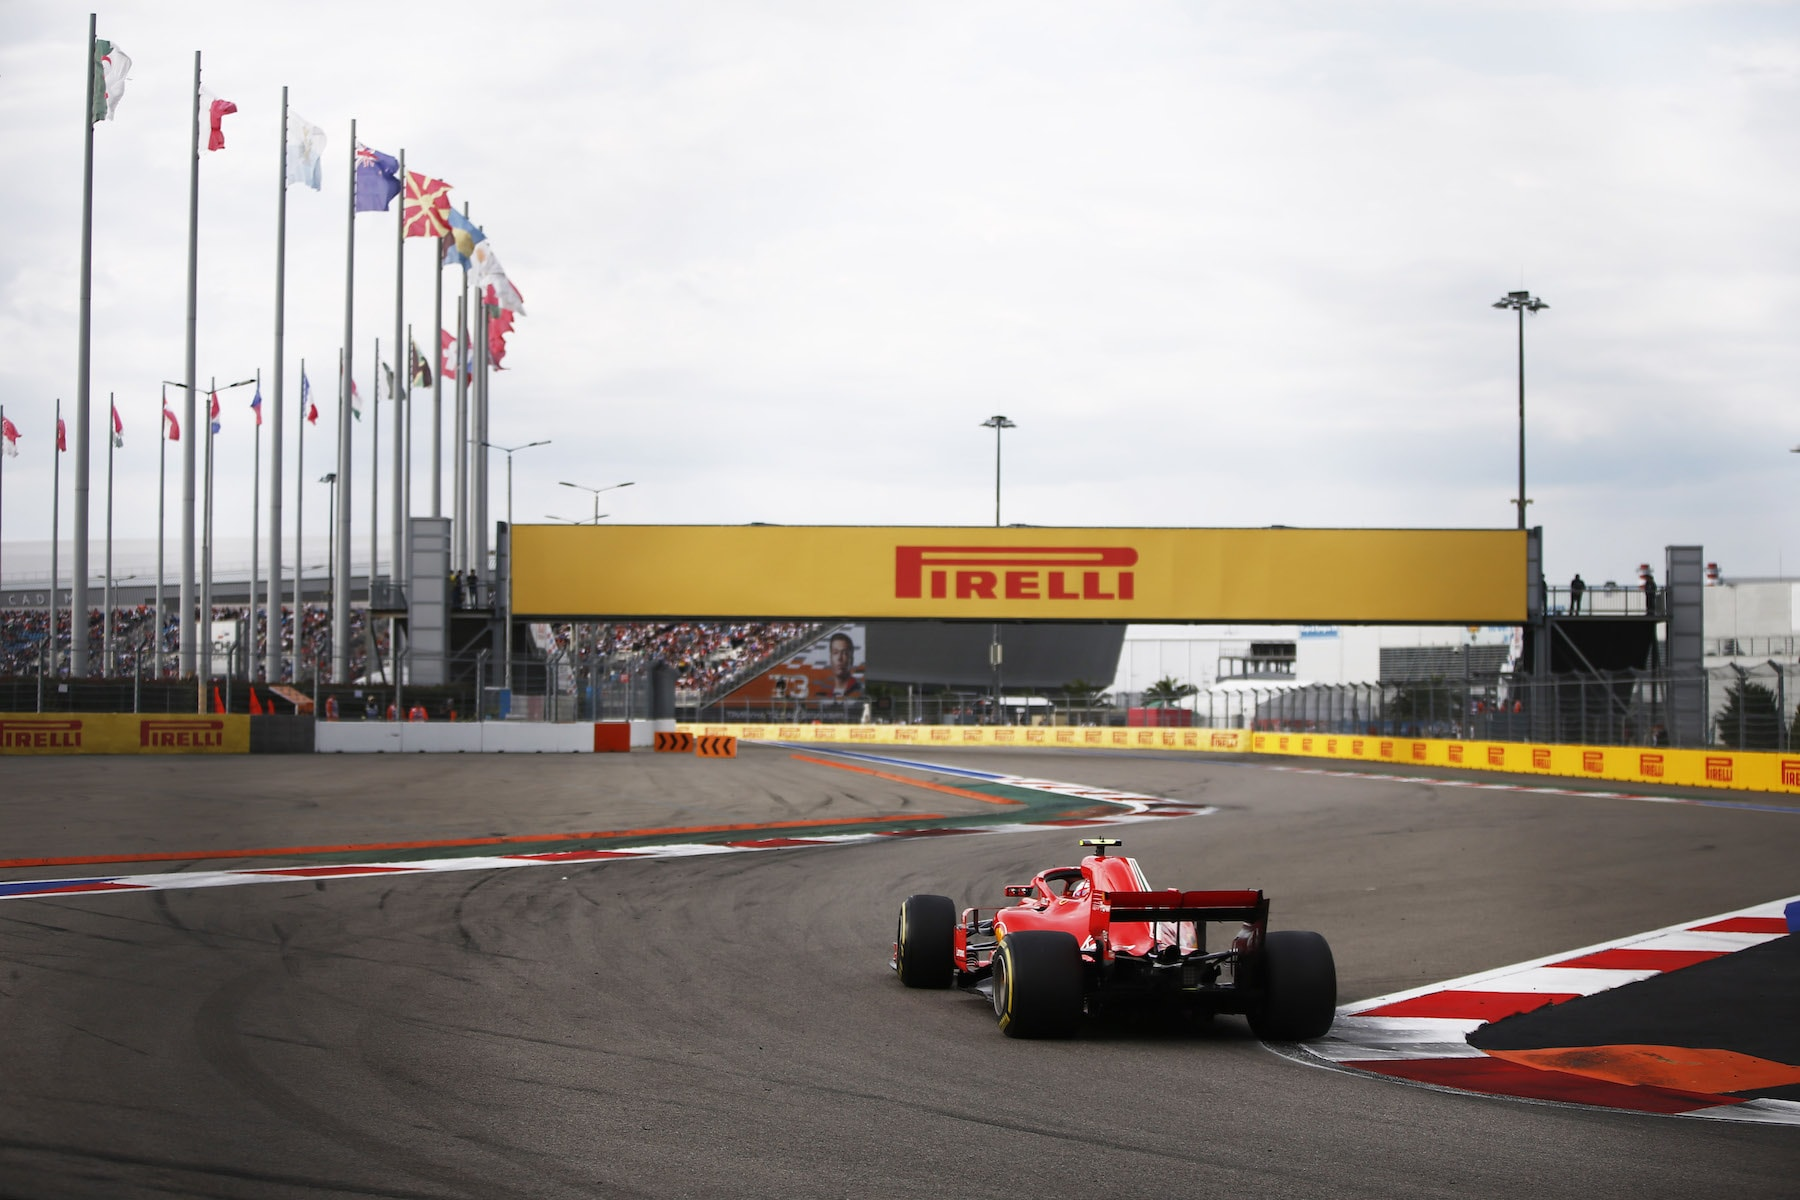 H 2018 Kimi Raikkonen | Ferrari SF71H | 2018 Russian GP P4 1 copy.jpg